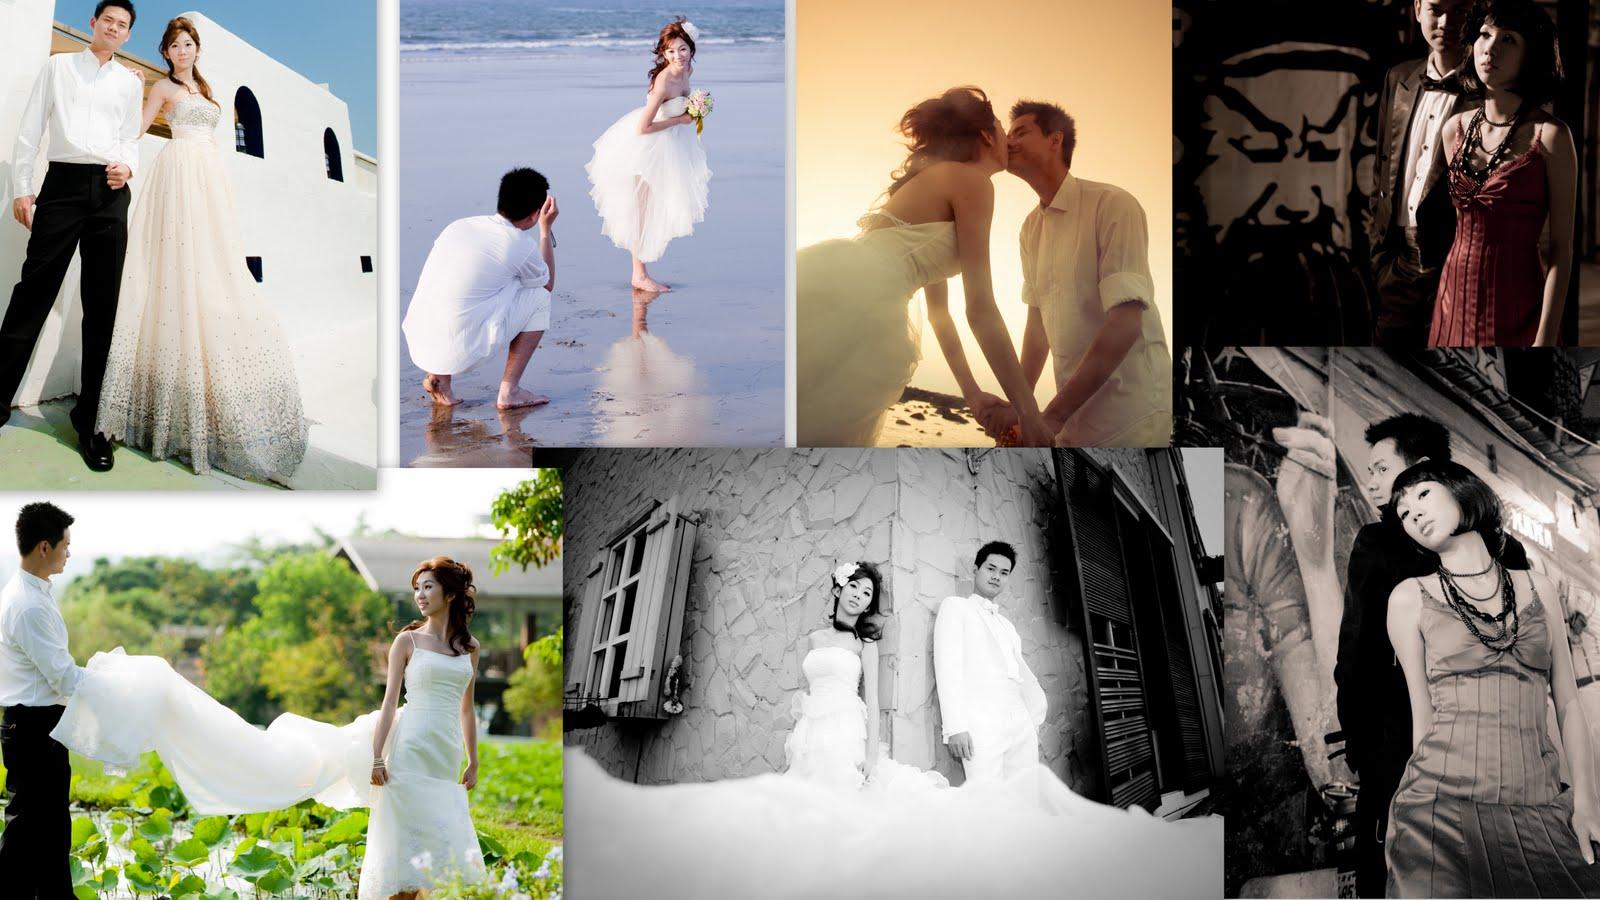 Wedding Photoshoot Ideas Wedding Styles